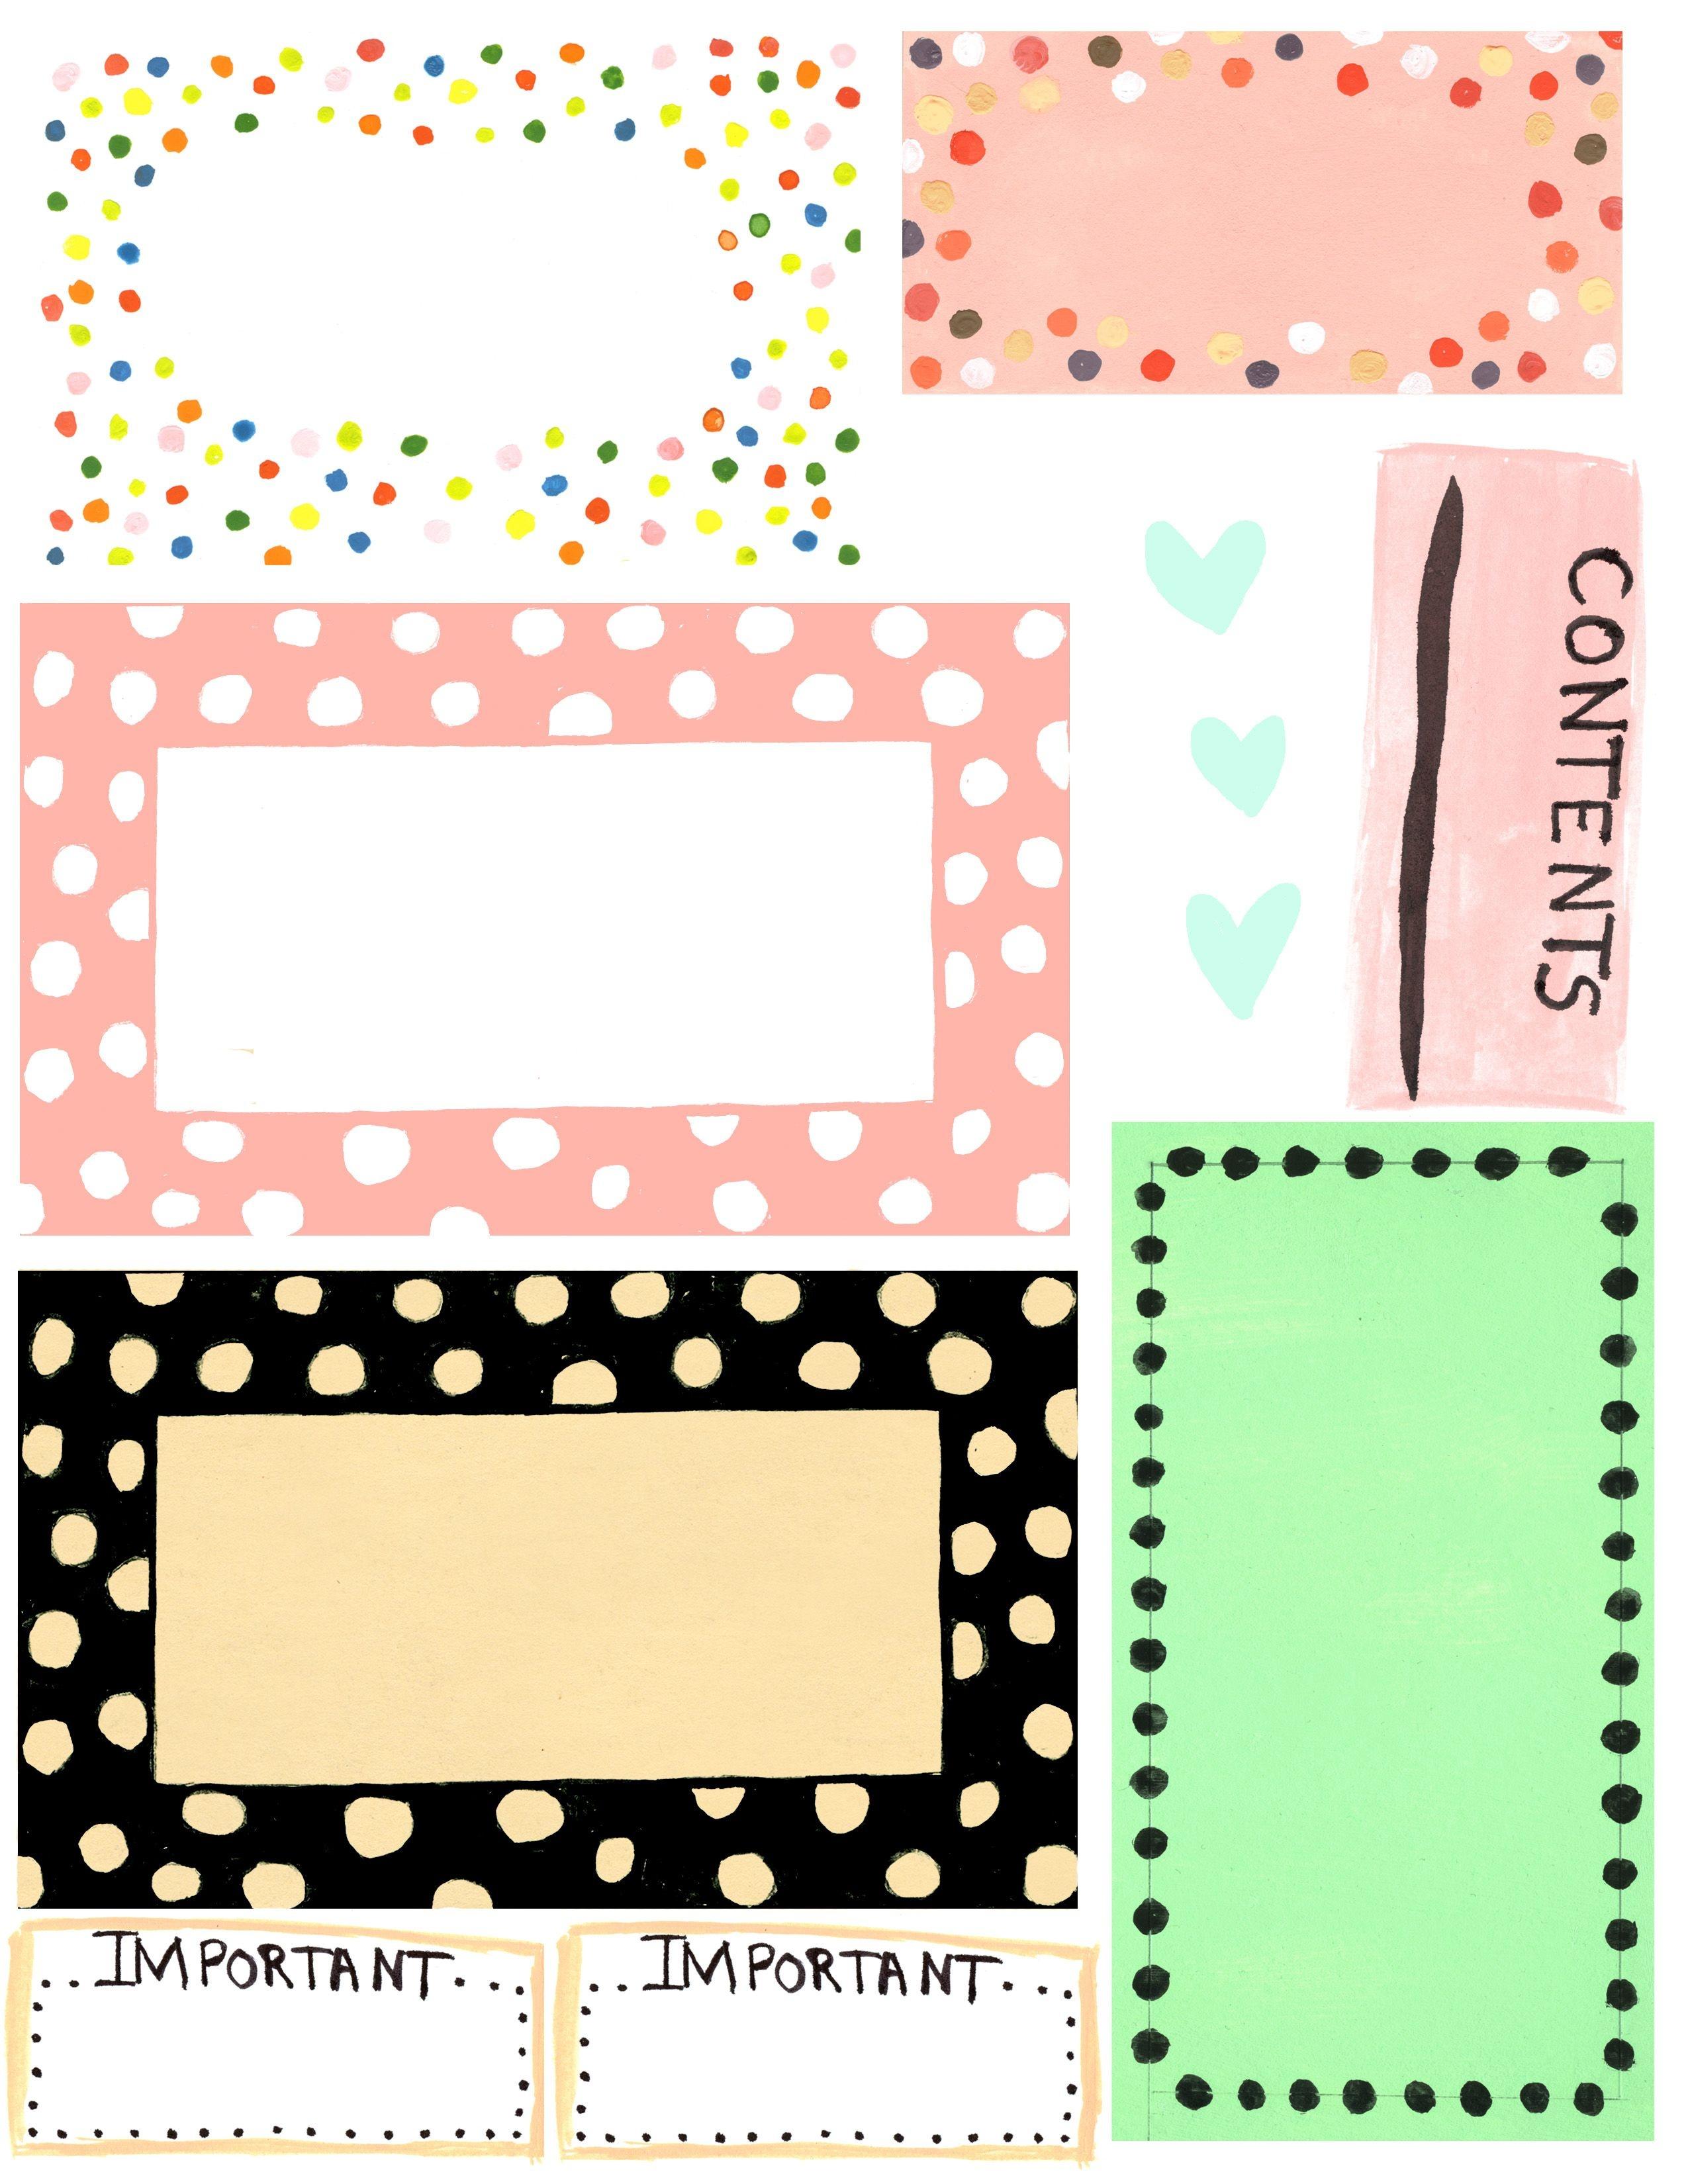 Free Printable Label Design Template Cakepins | Christmas Place - Free Editable Printable Labels